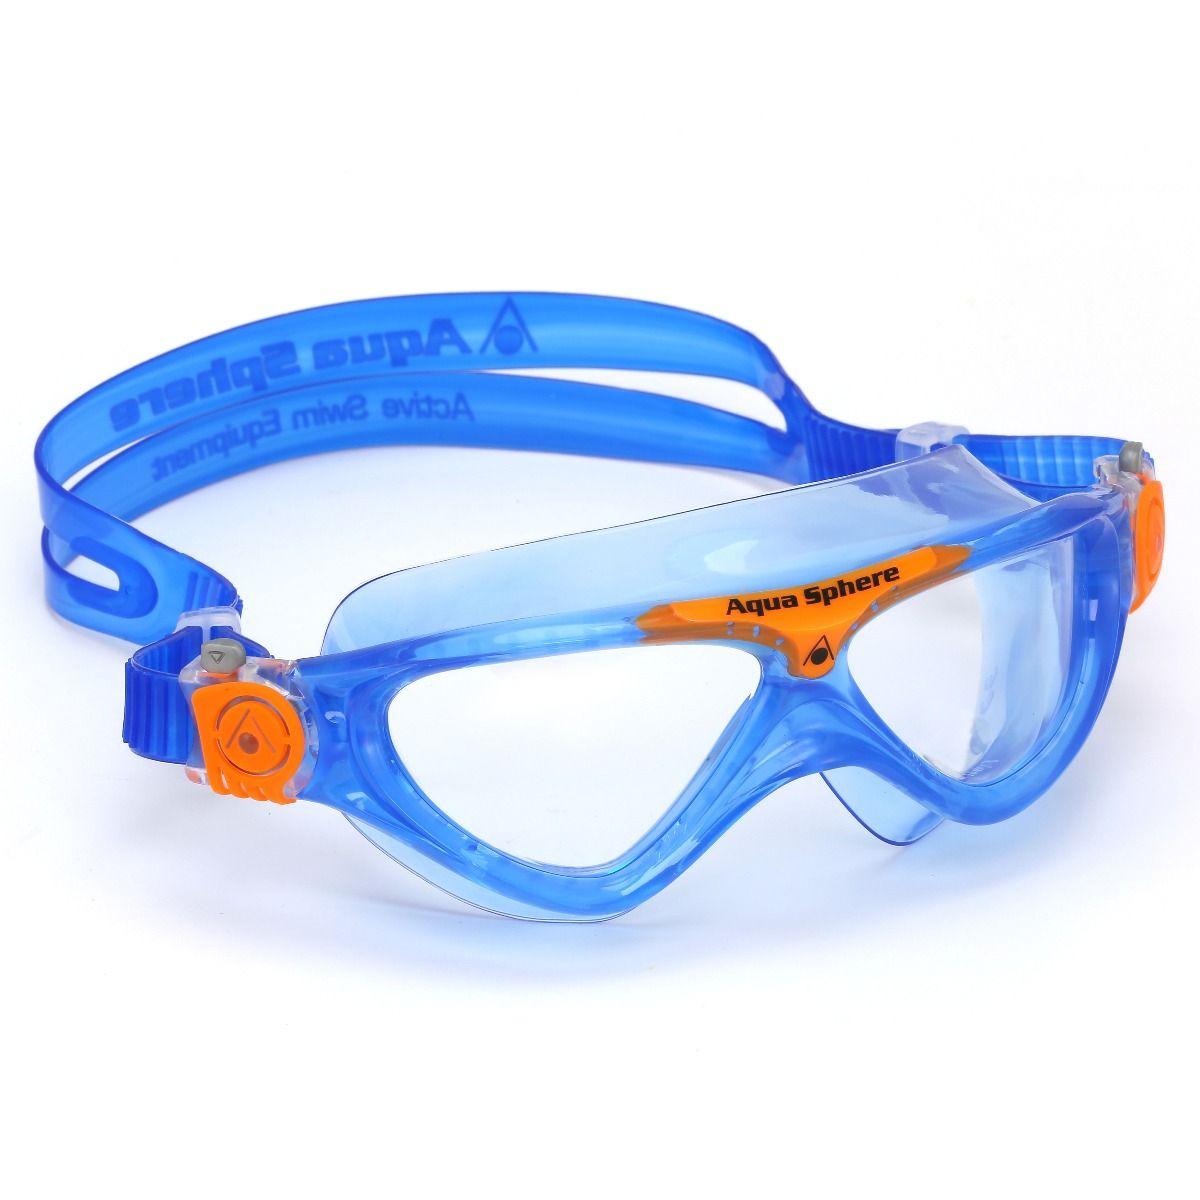 Aqua sphere vista junior clear lens swimming goggles swimspace for Aqua vista swimming pool aurora co